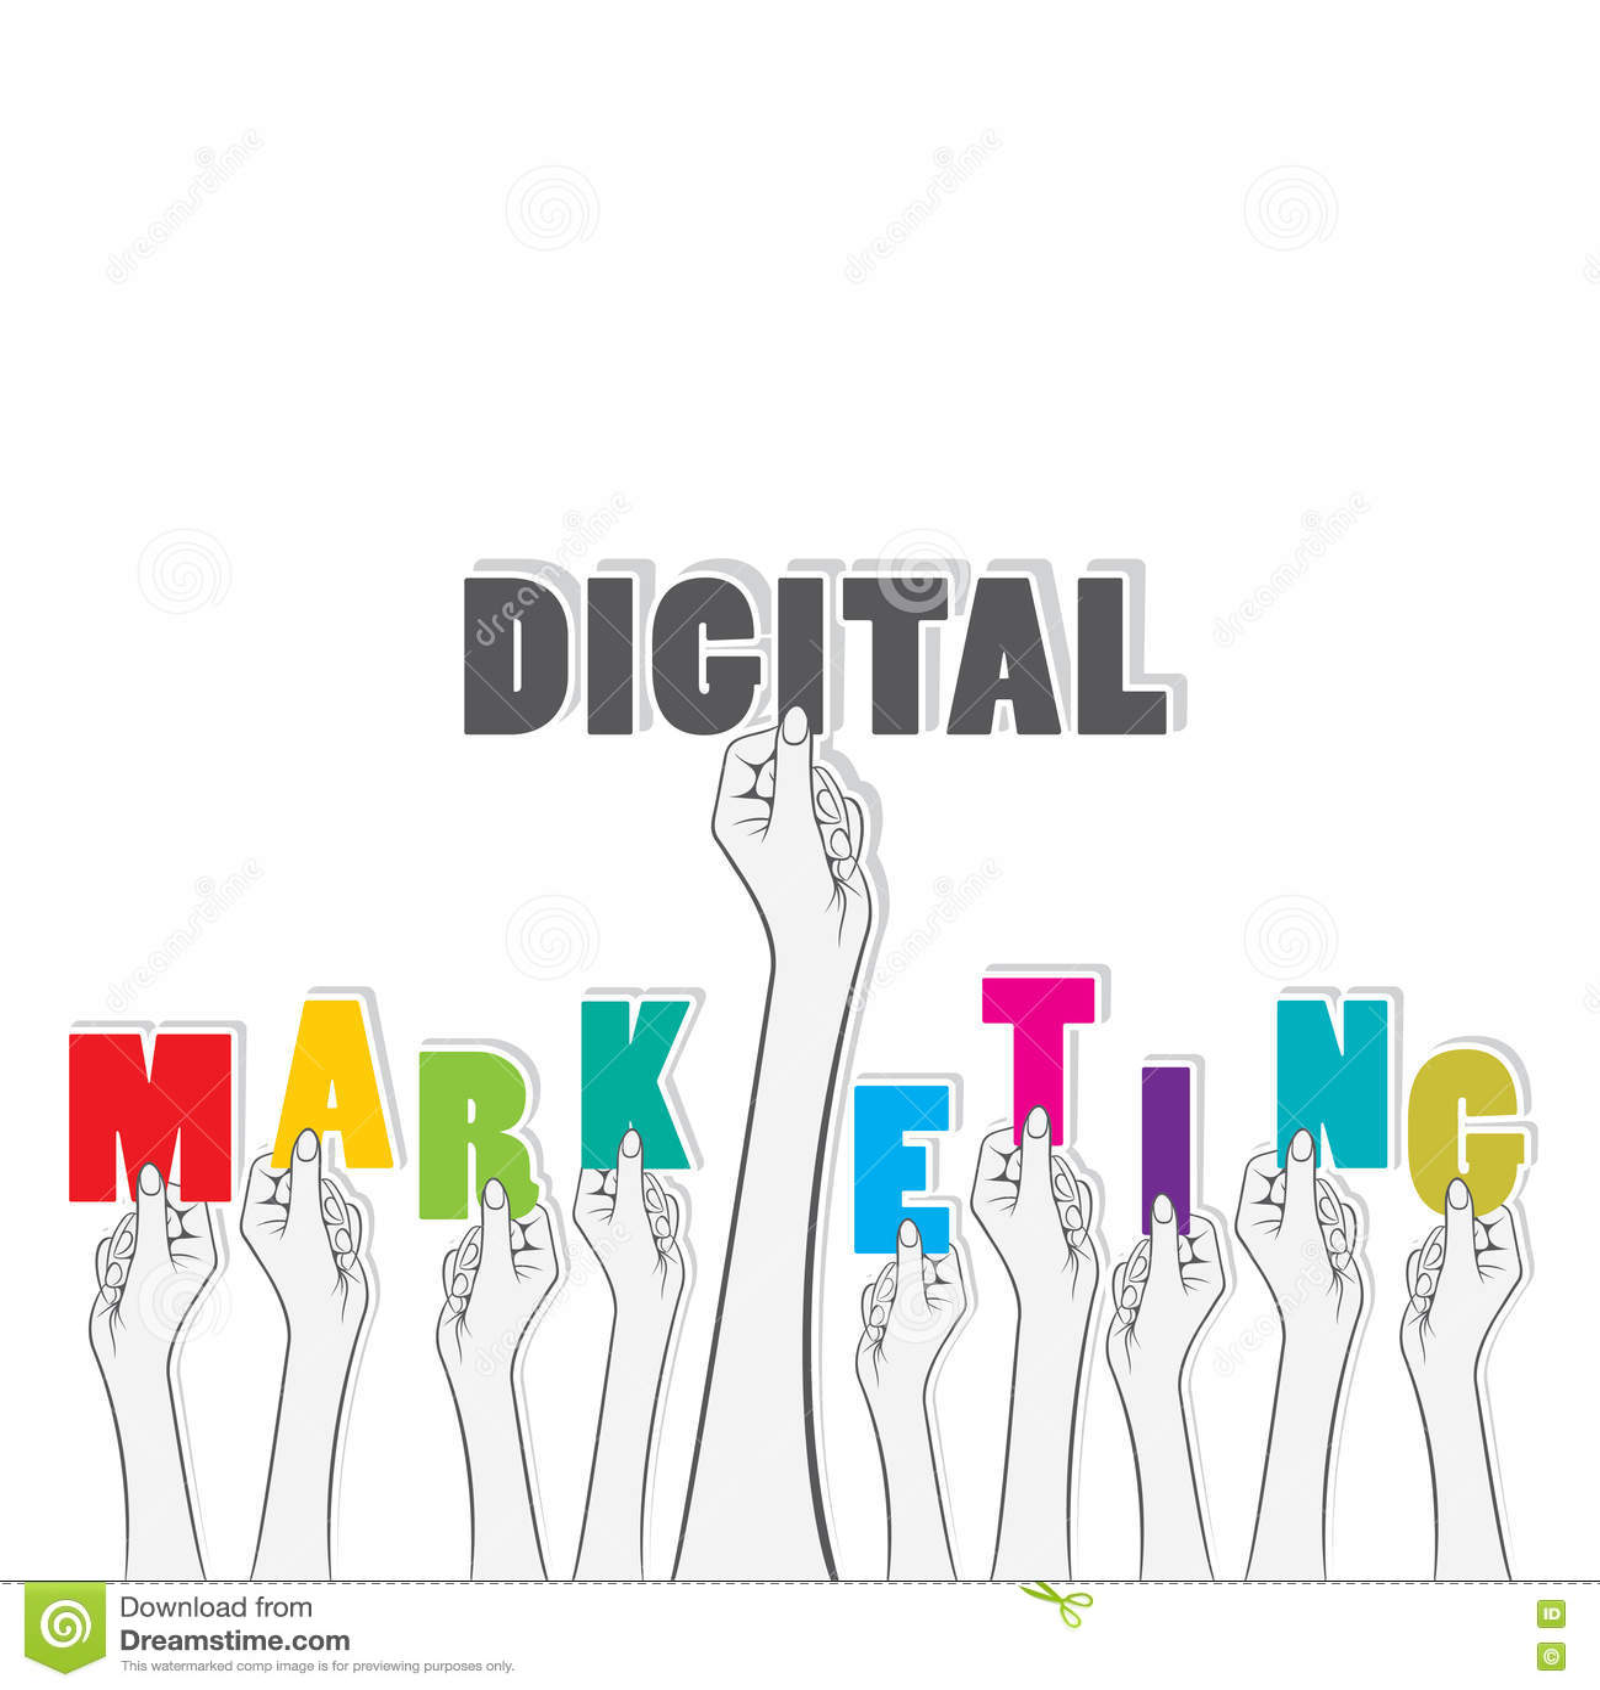 digital marketing text banner design stock vector  image: 67328249